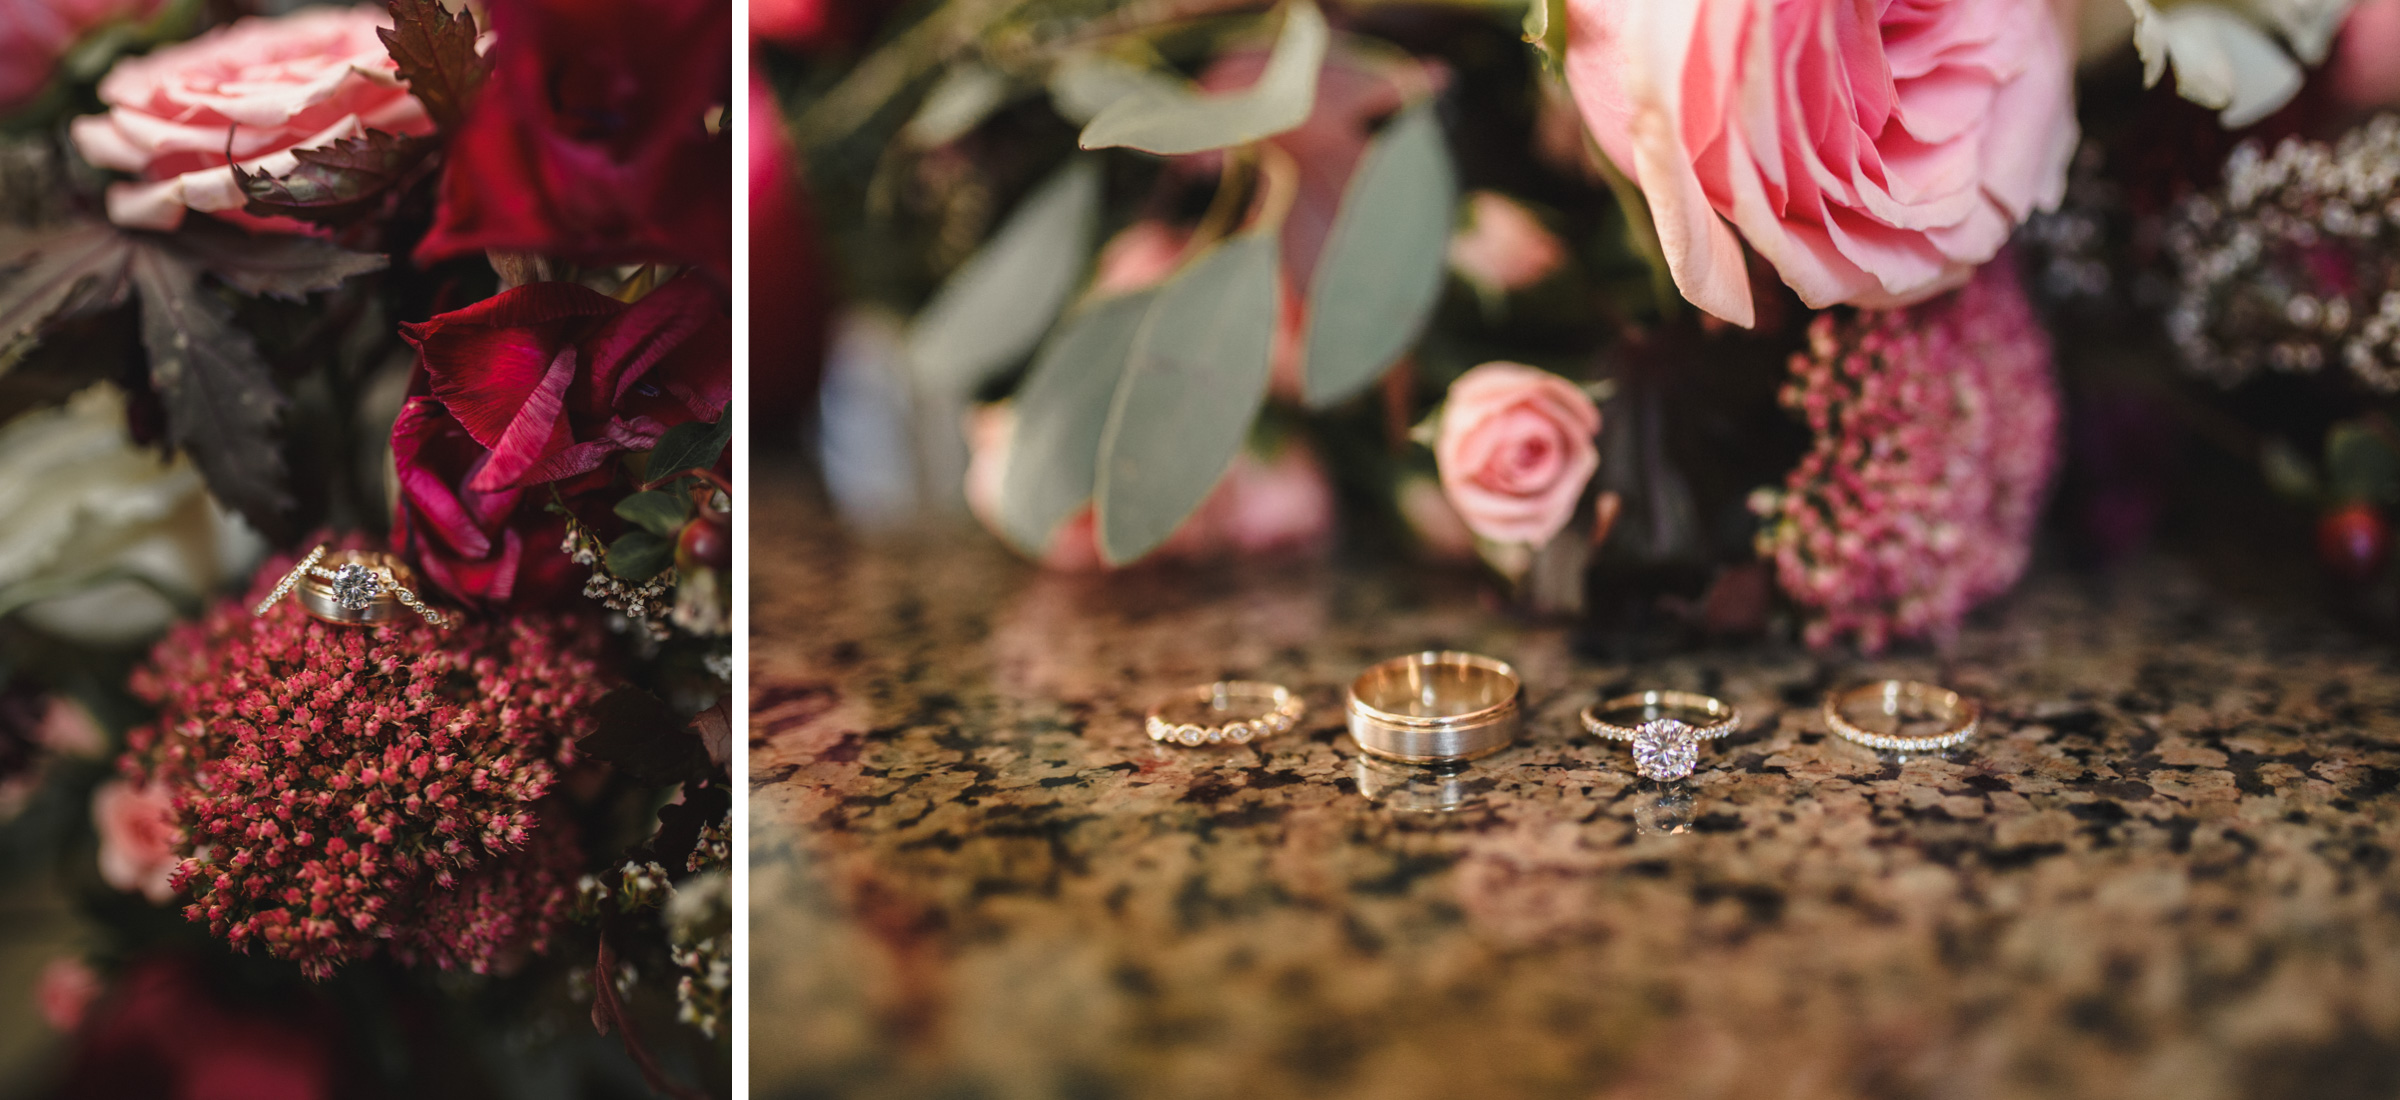 kiley_trent_lawrence_kansas_ku_campus_kelsey_diane_photography_kansas_city_wedding_7.jpg